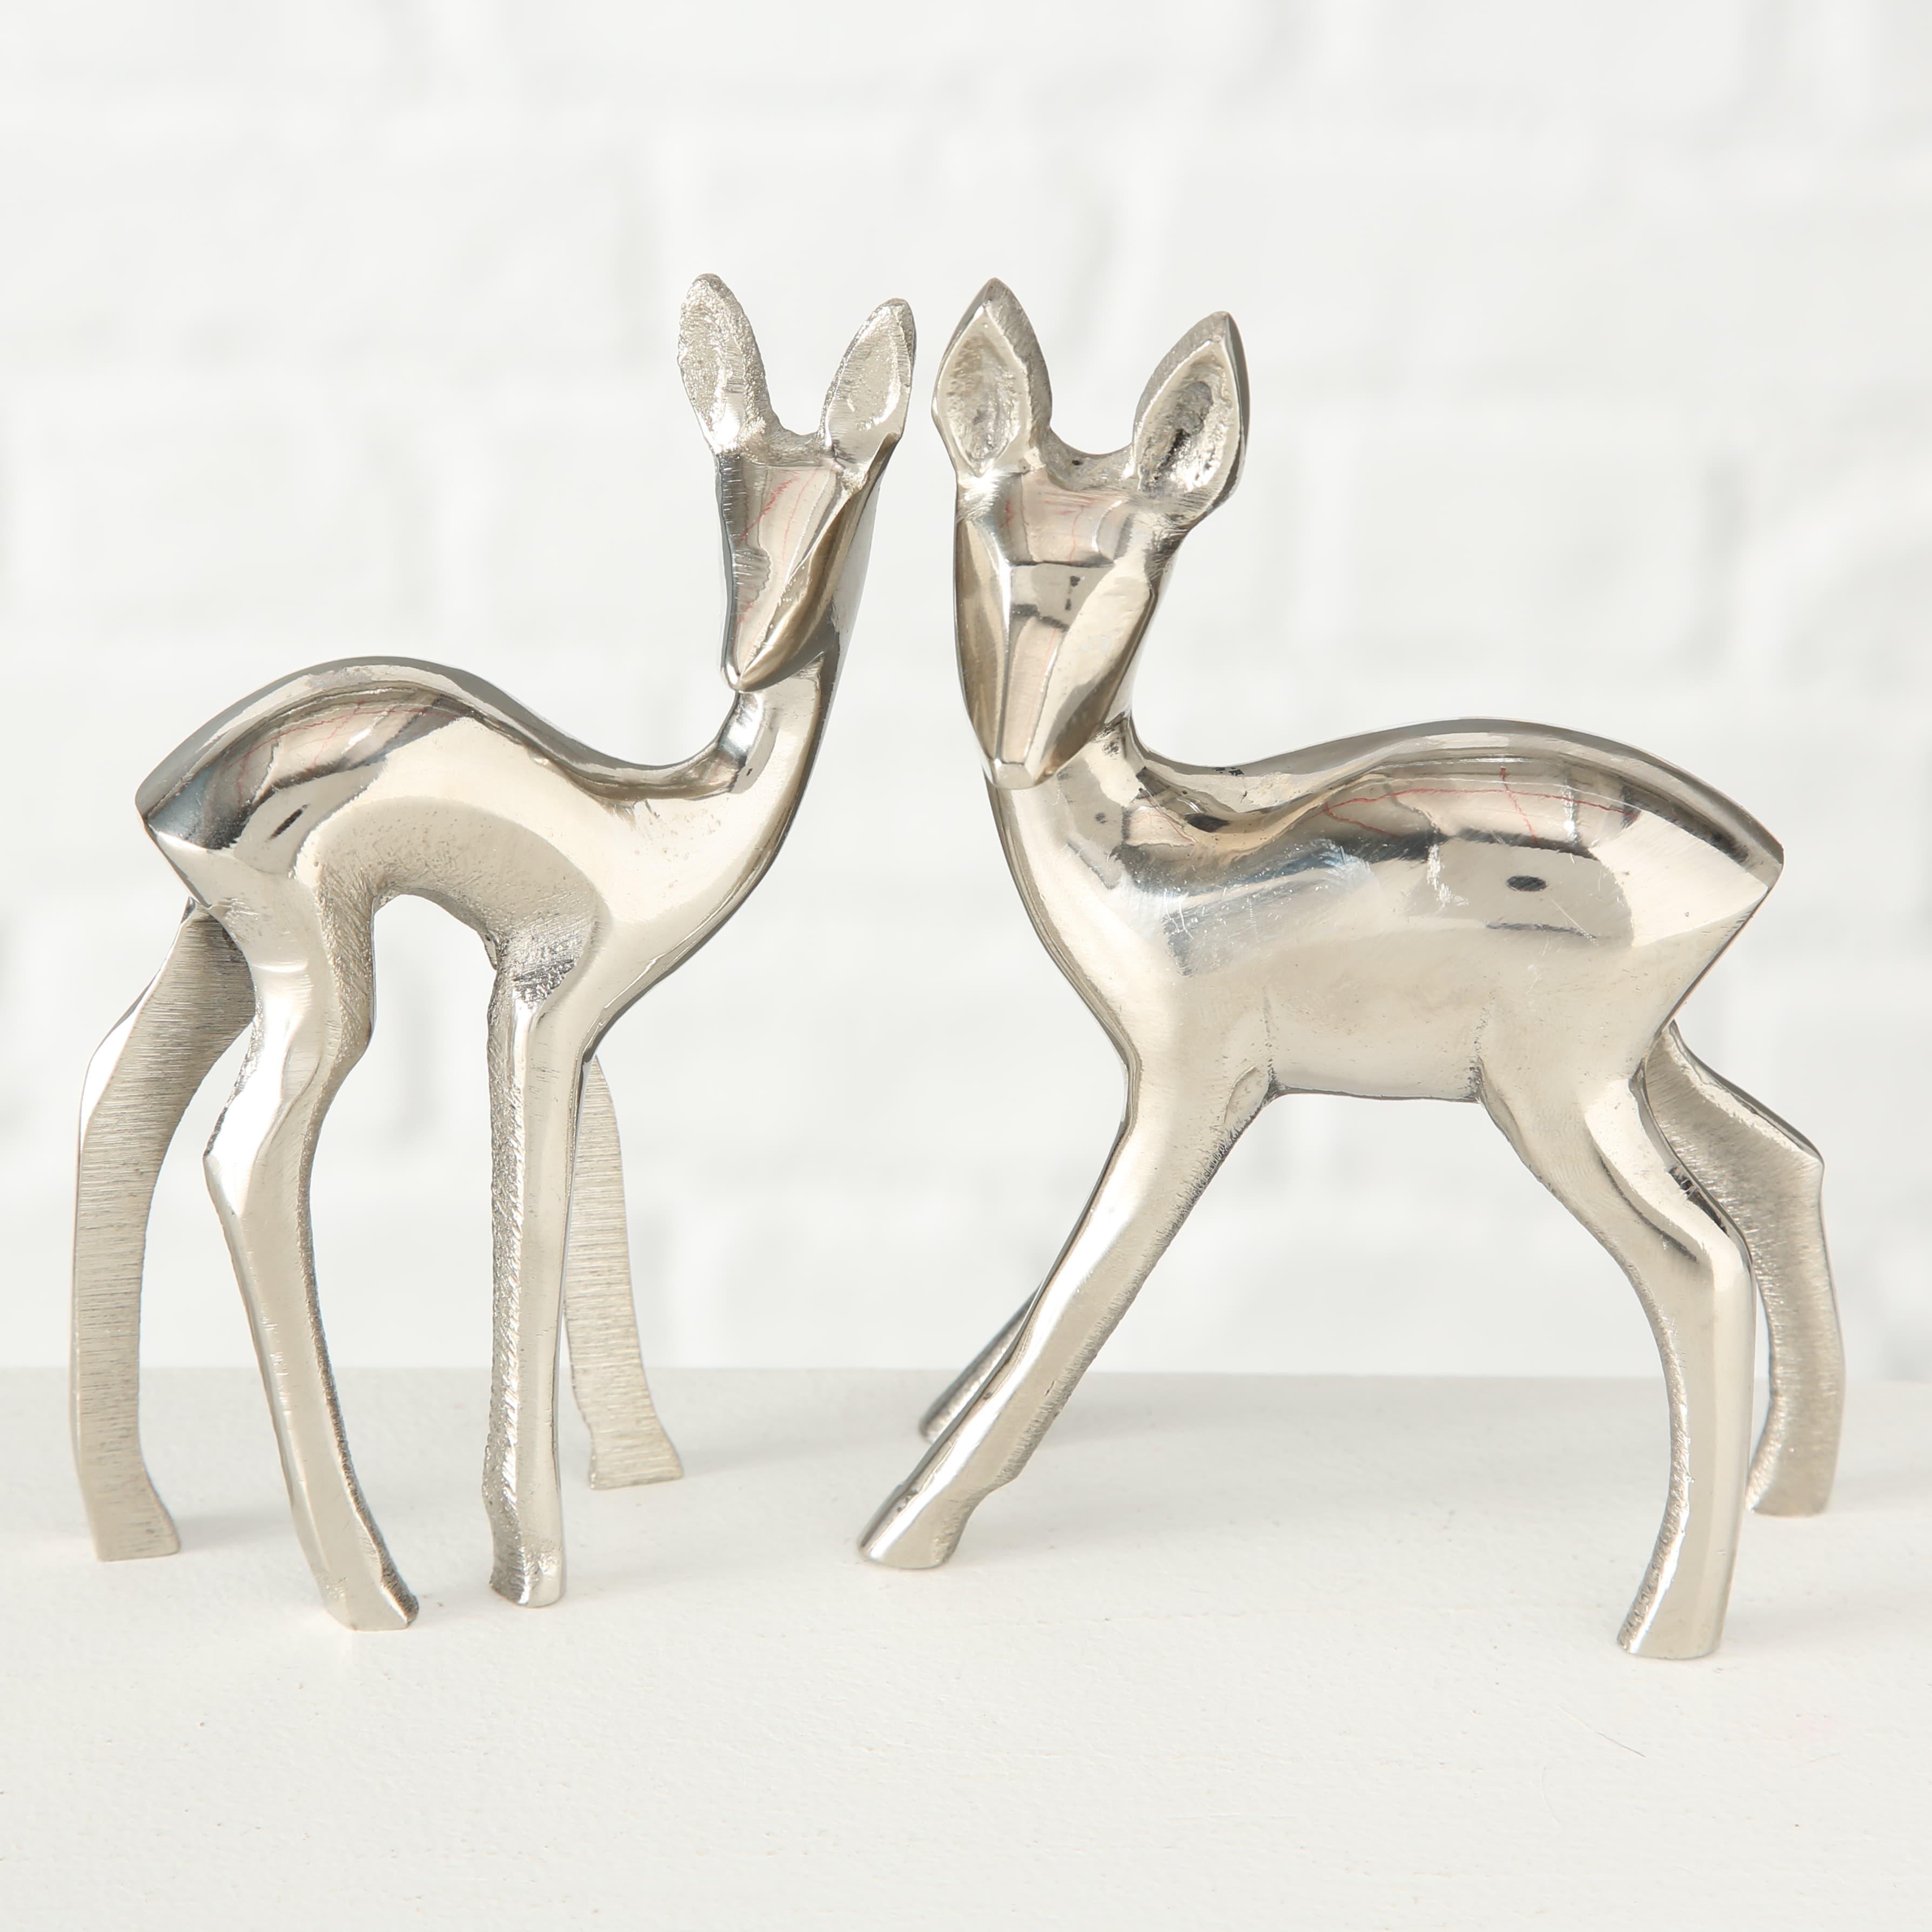 Decoratiune metalica Bambi Argintiu, Modele Asortate, l9xA13xH13 cm